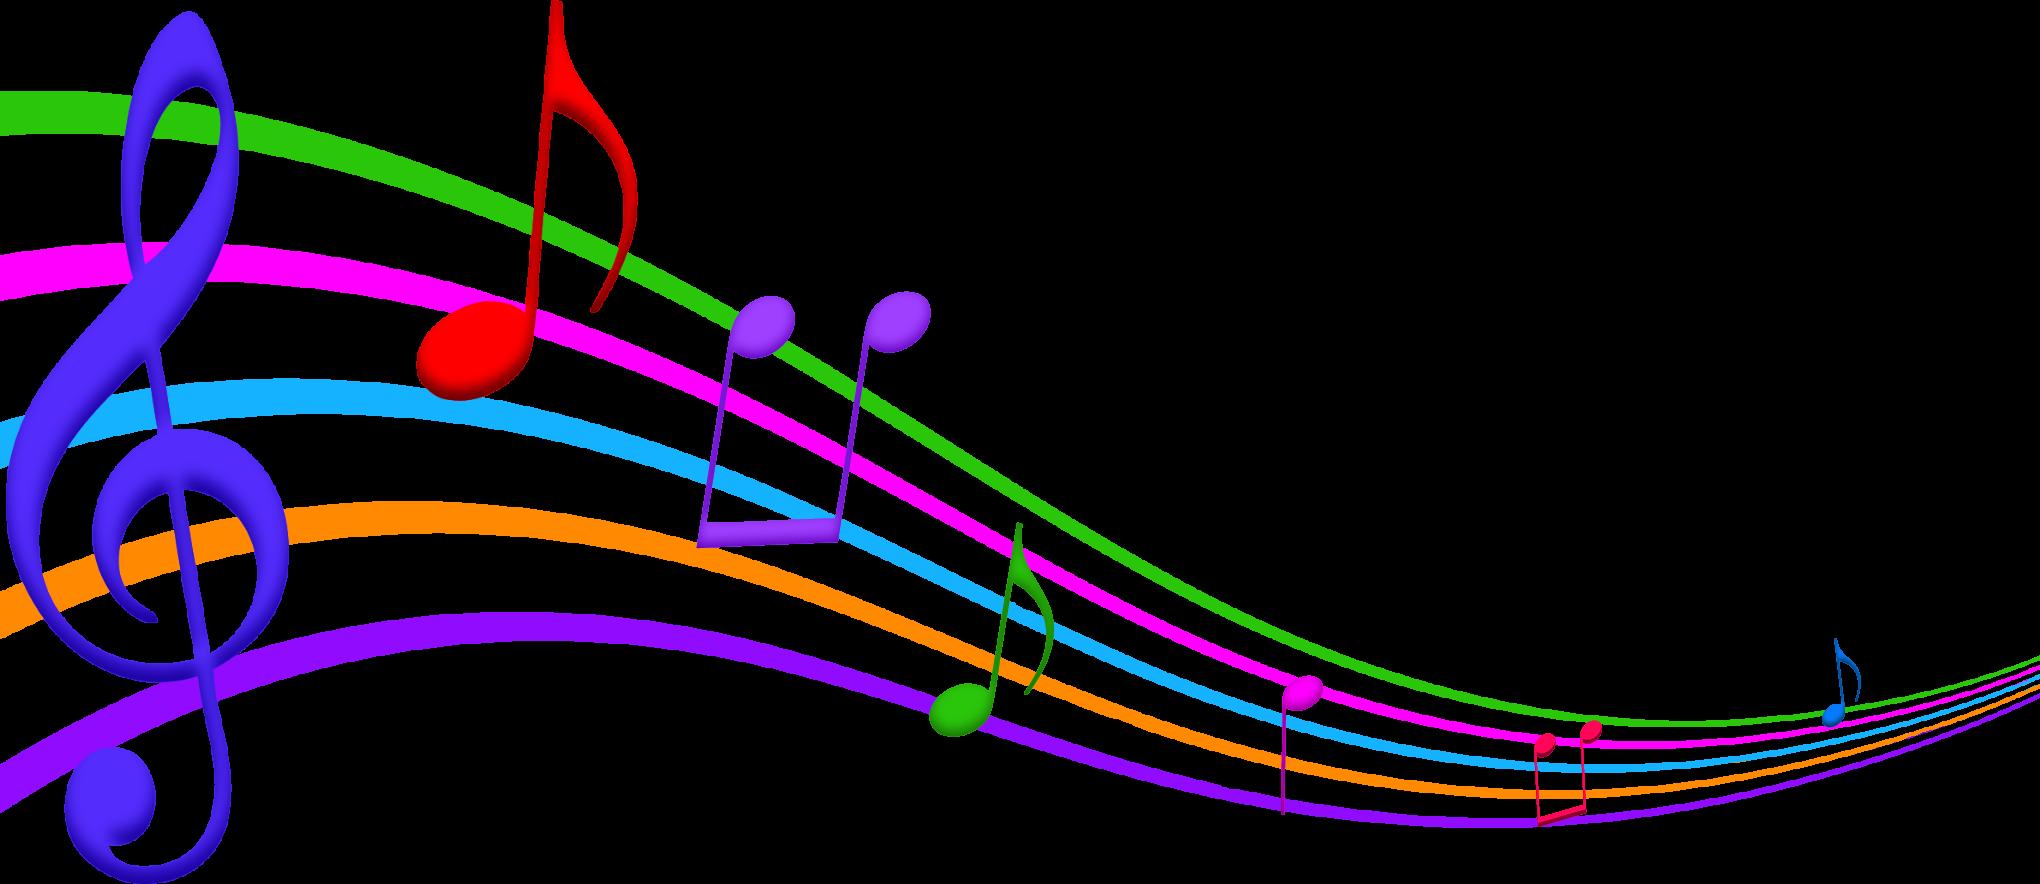 Musical notes transparent background free download best musical 2040x884 png transparent background clipart voltagebd Images